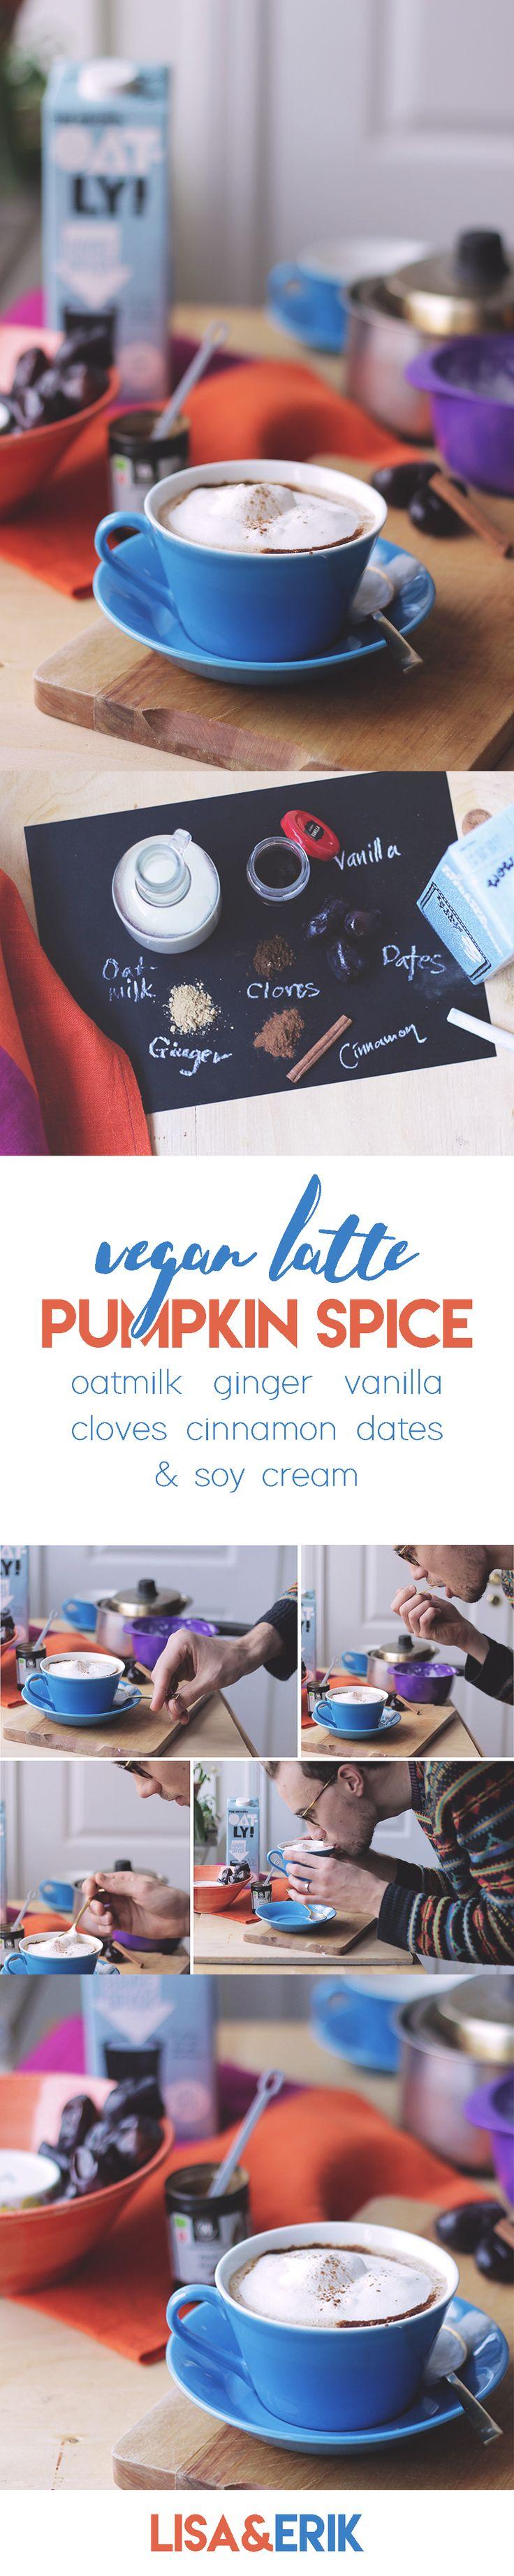 Vegan Pumpkin Spice Latte Recipe - Healthy sweetend with Dates